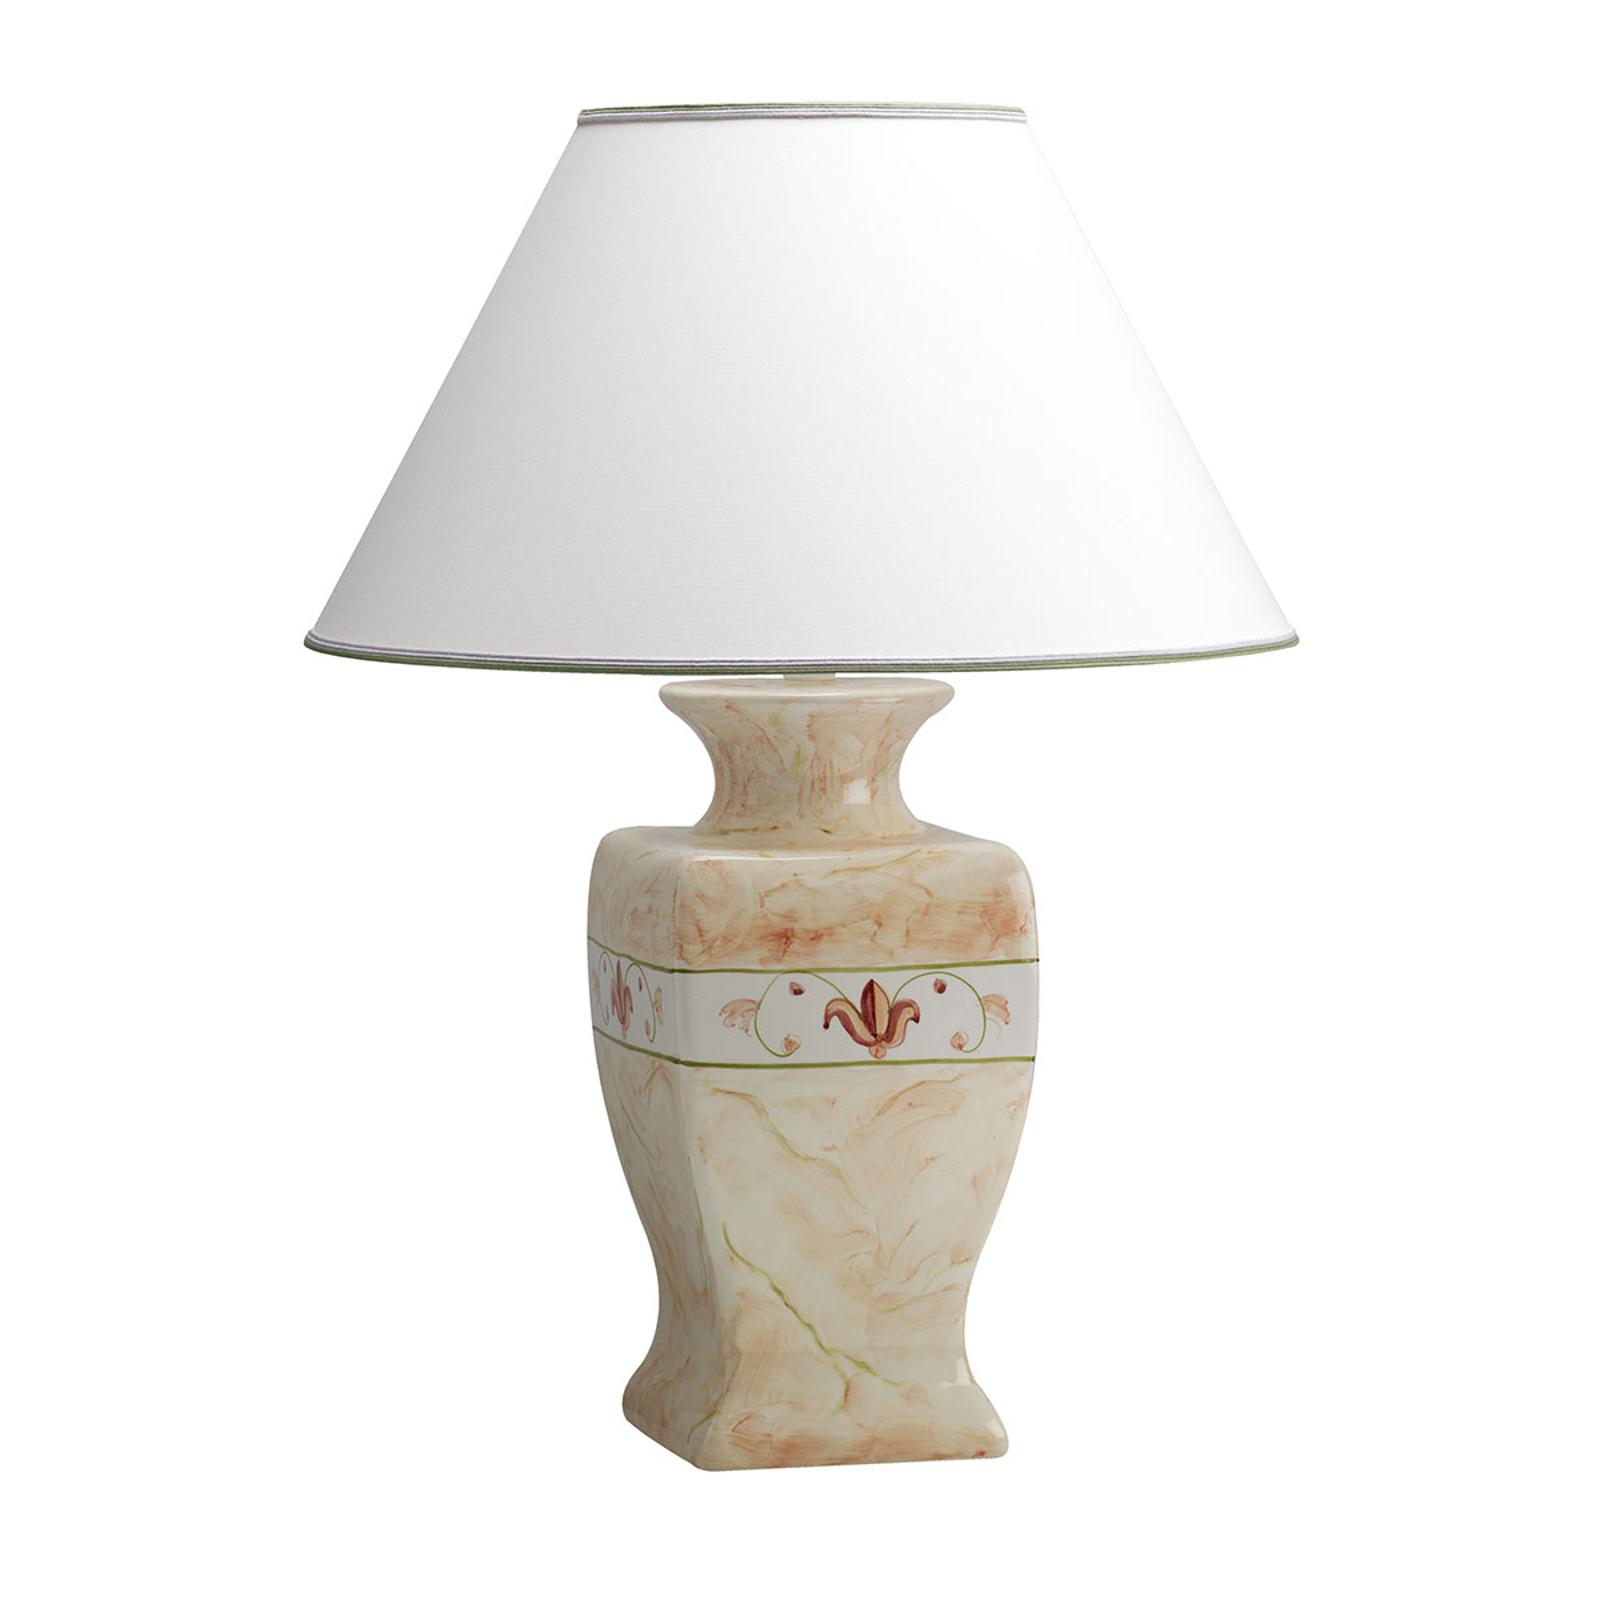 Keramik-Hockerleuchte Marmorino - Höhe 70 cm